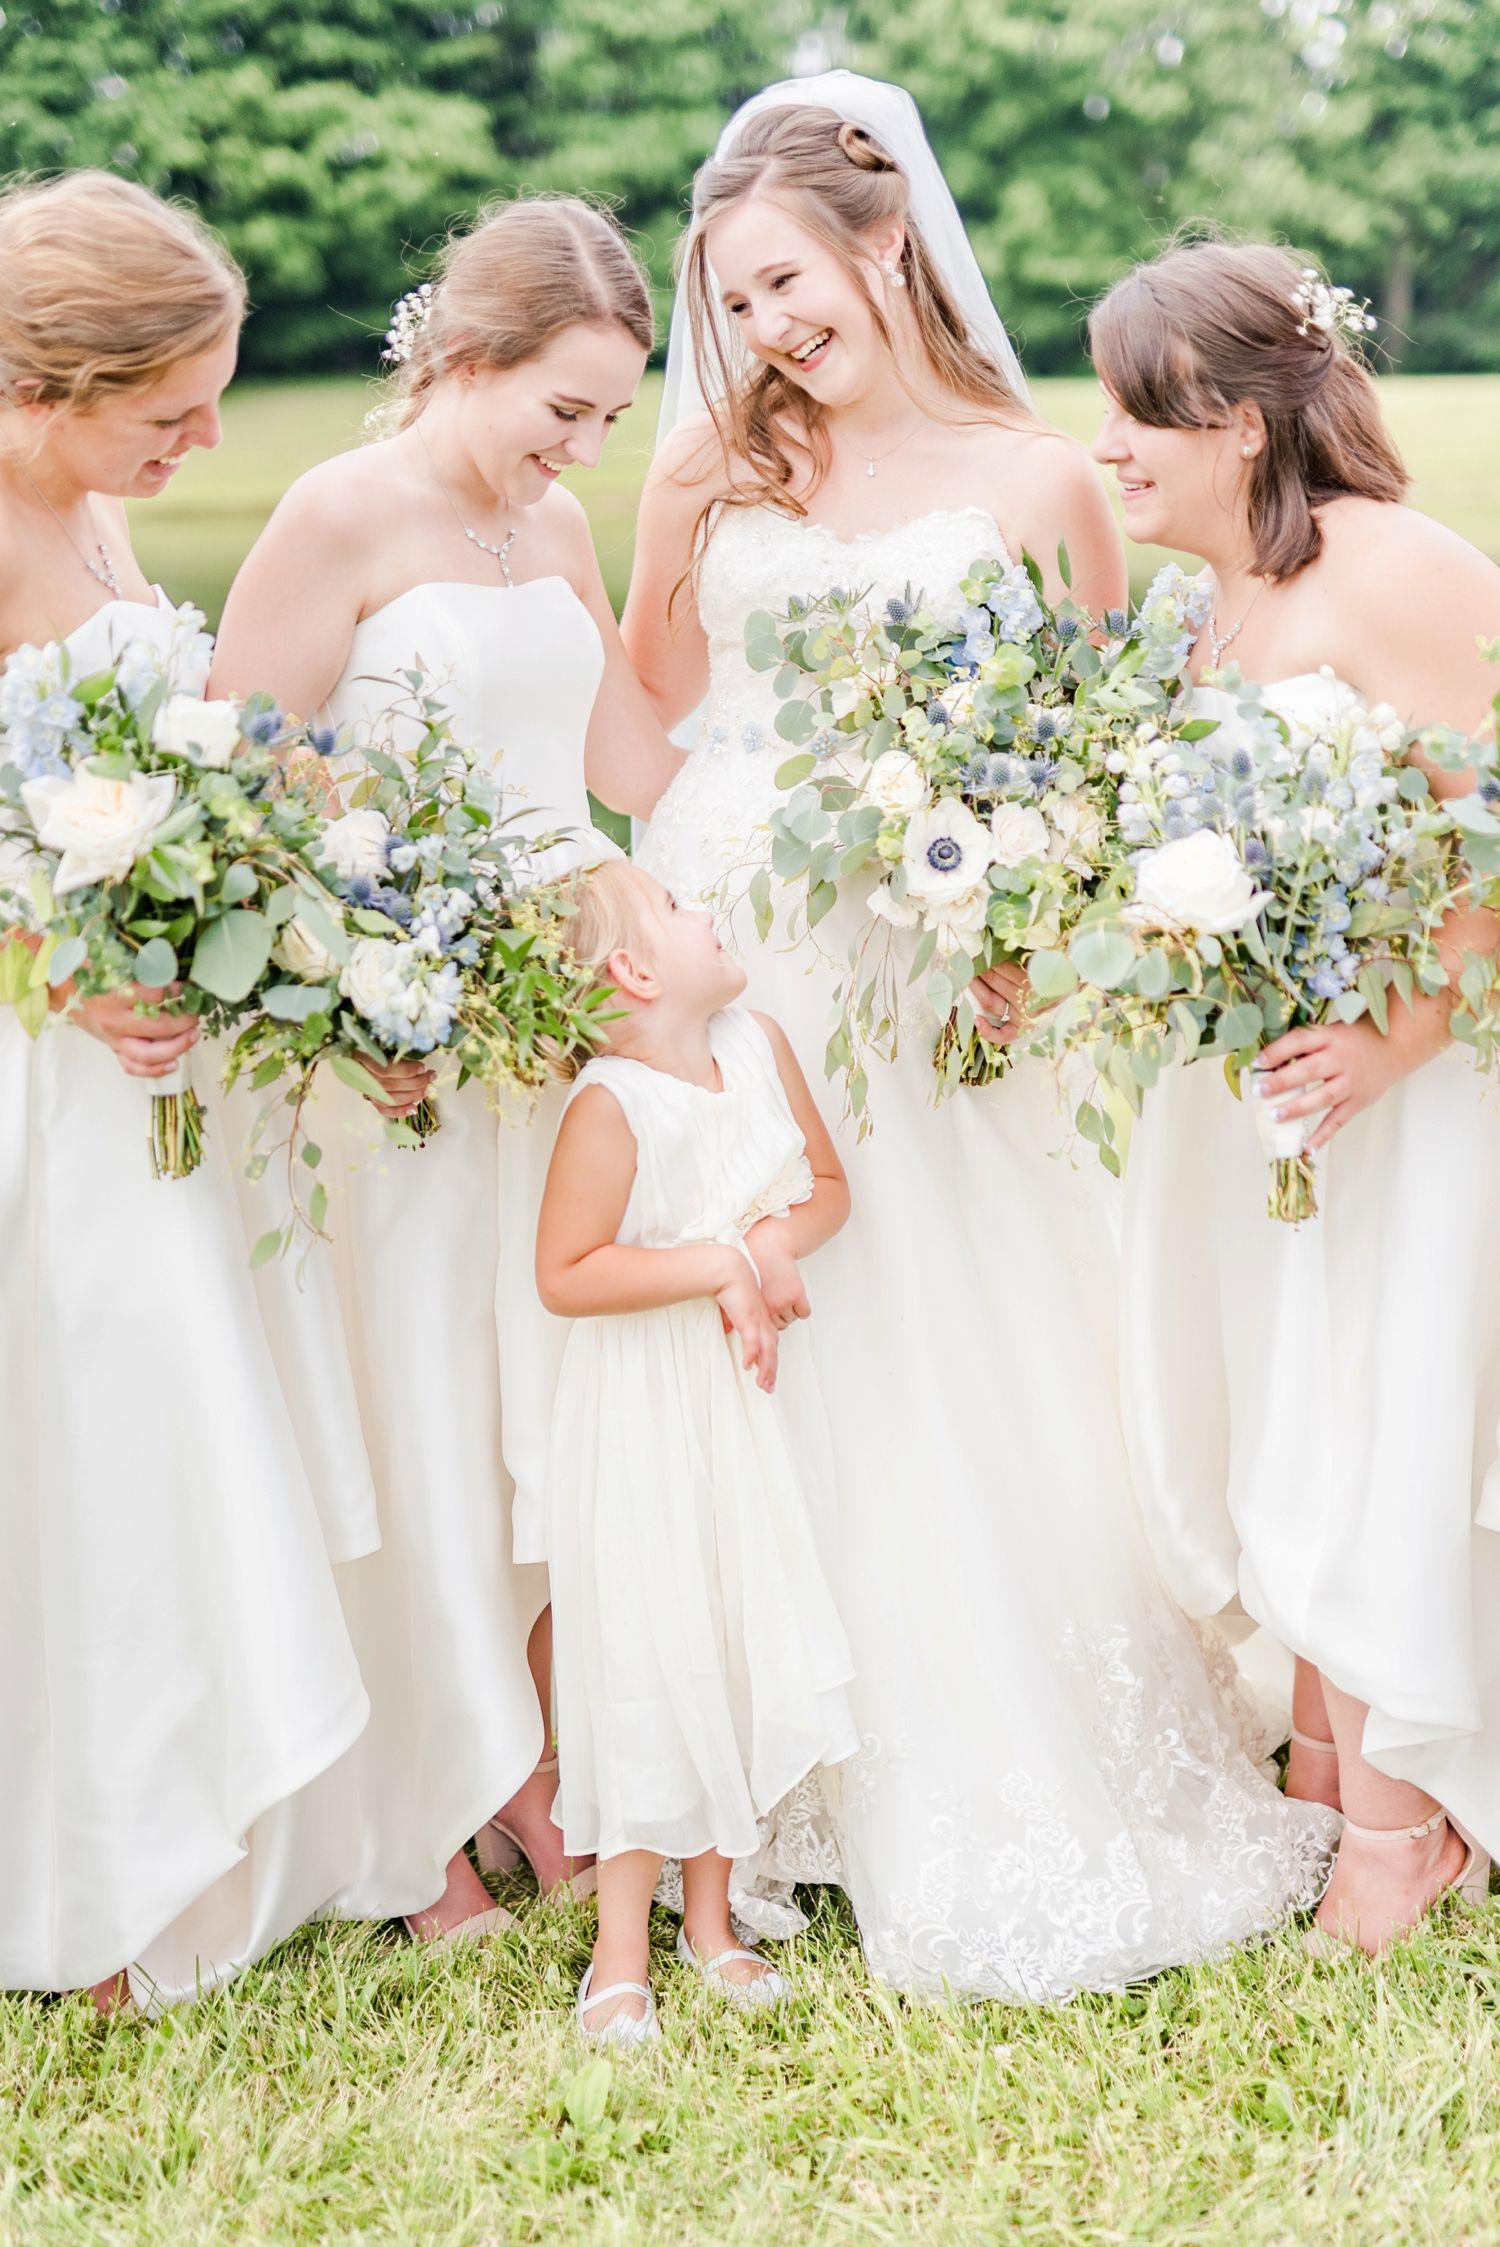 Best Of Weddings 2018 Bridesmaid Inspiration Bridesmaid White Bridesmaid Dresses